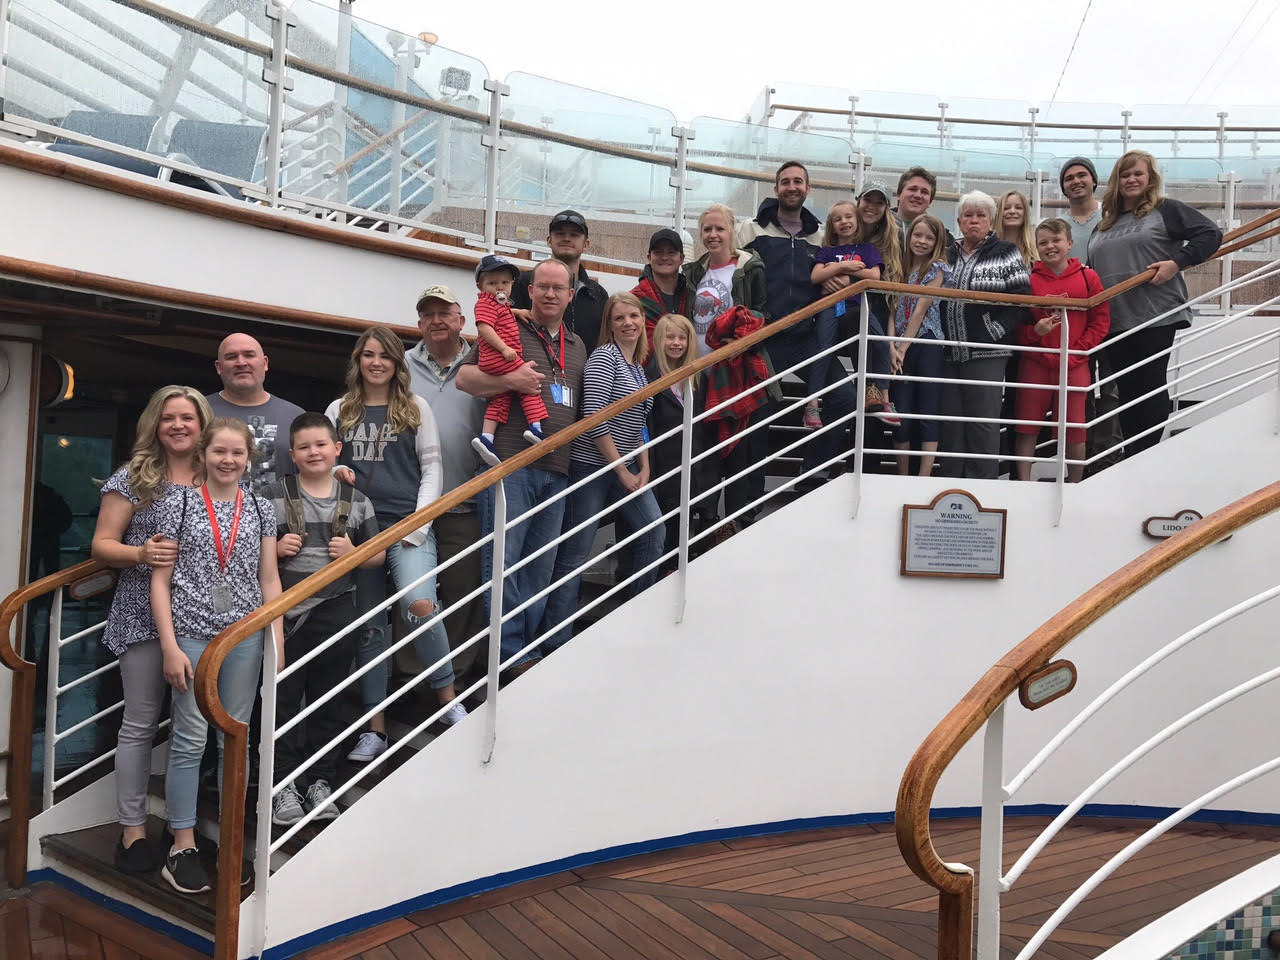 St George Resident On Alaskan Cruise Recounts Night